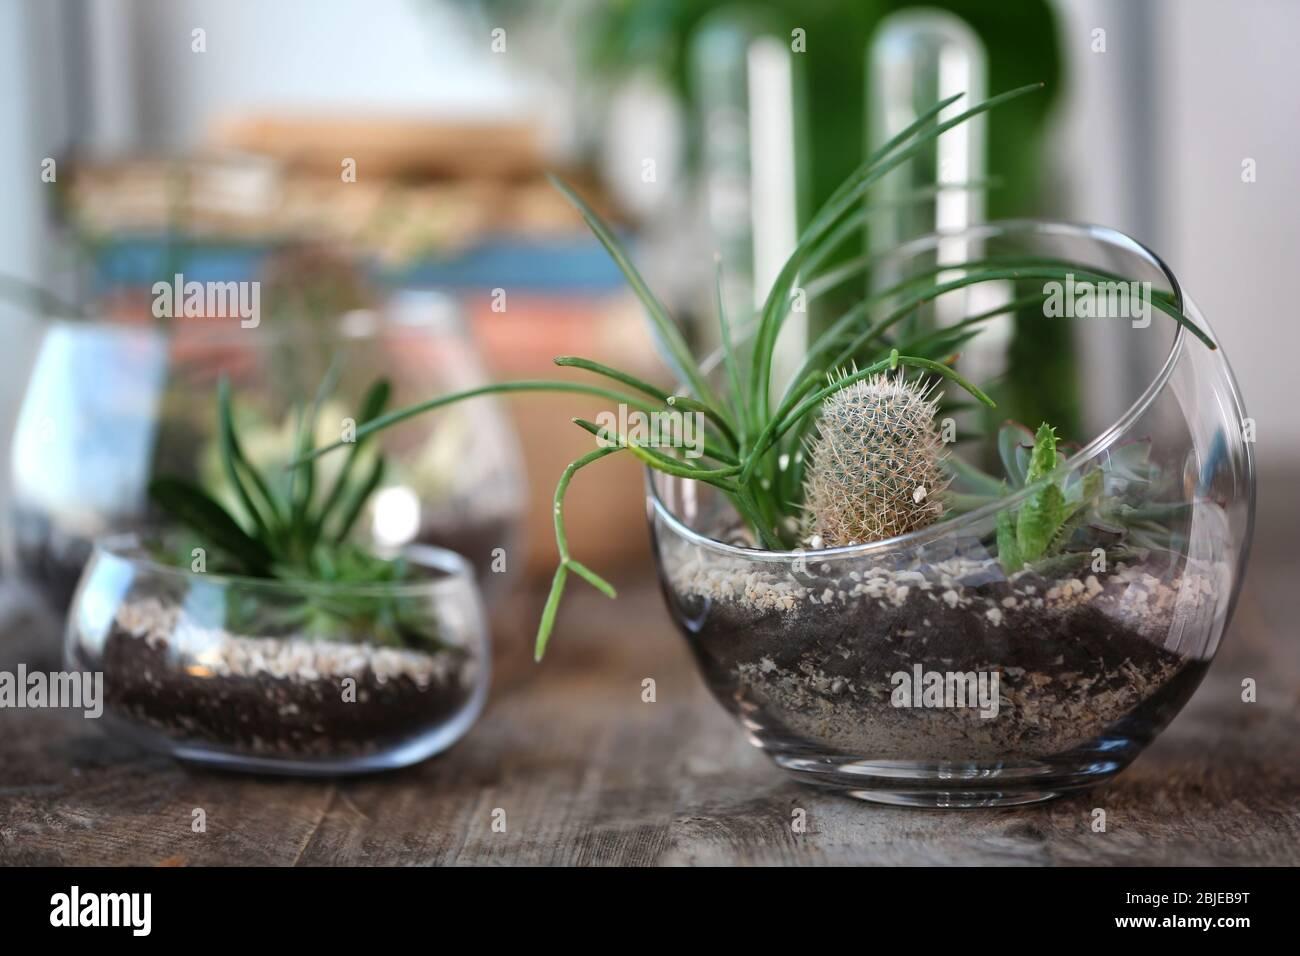 Mini Succulent Garden In Glass Terrarium On Wooden Table Stock Photo Alamy